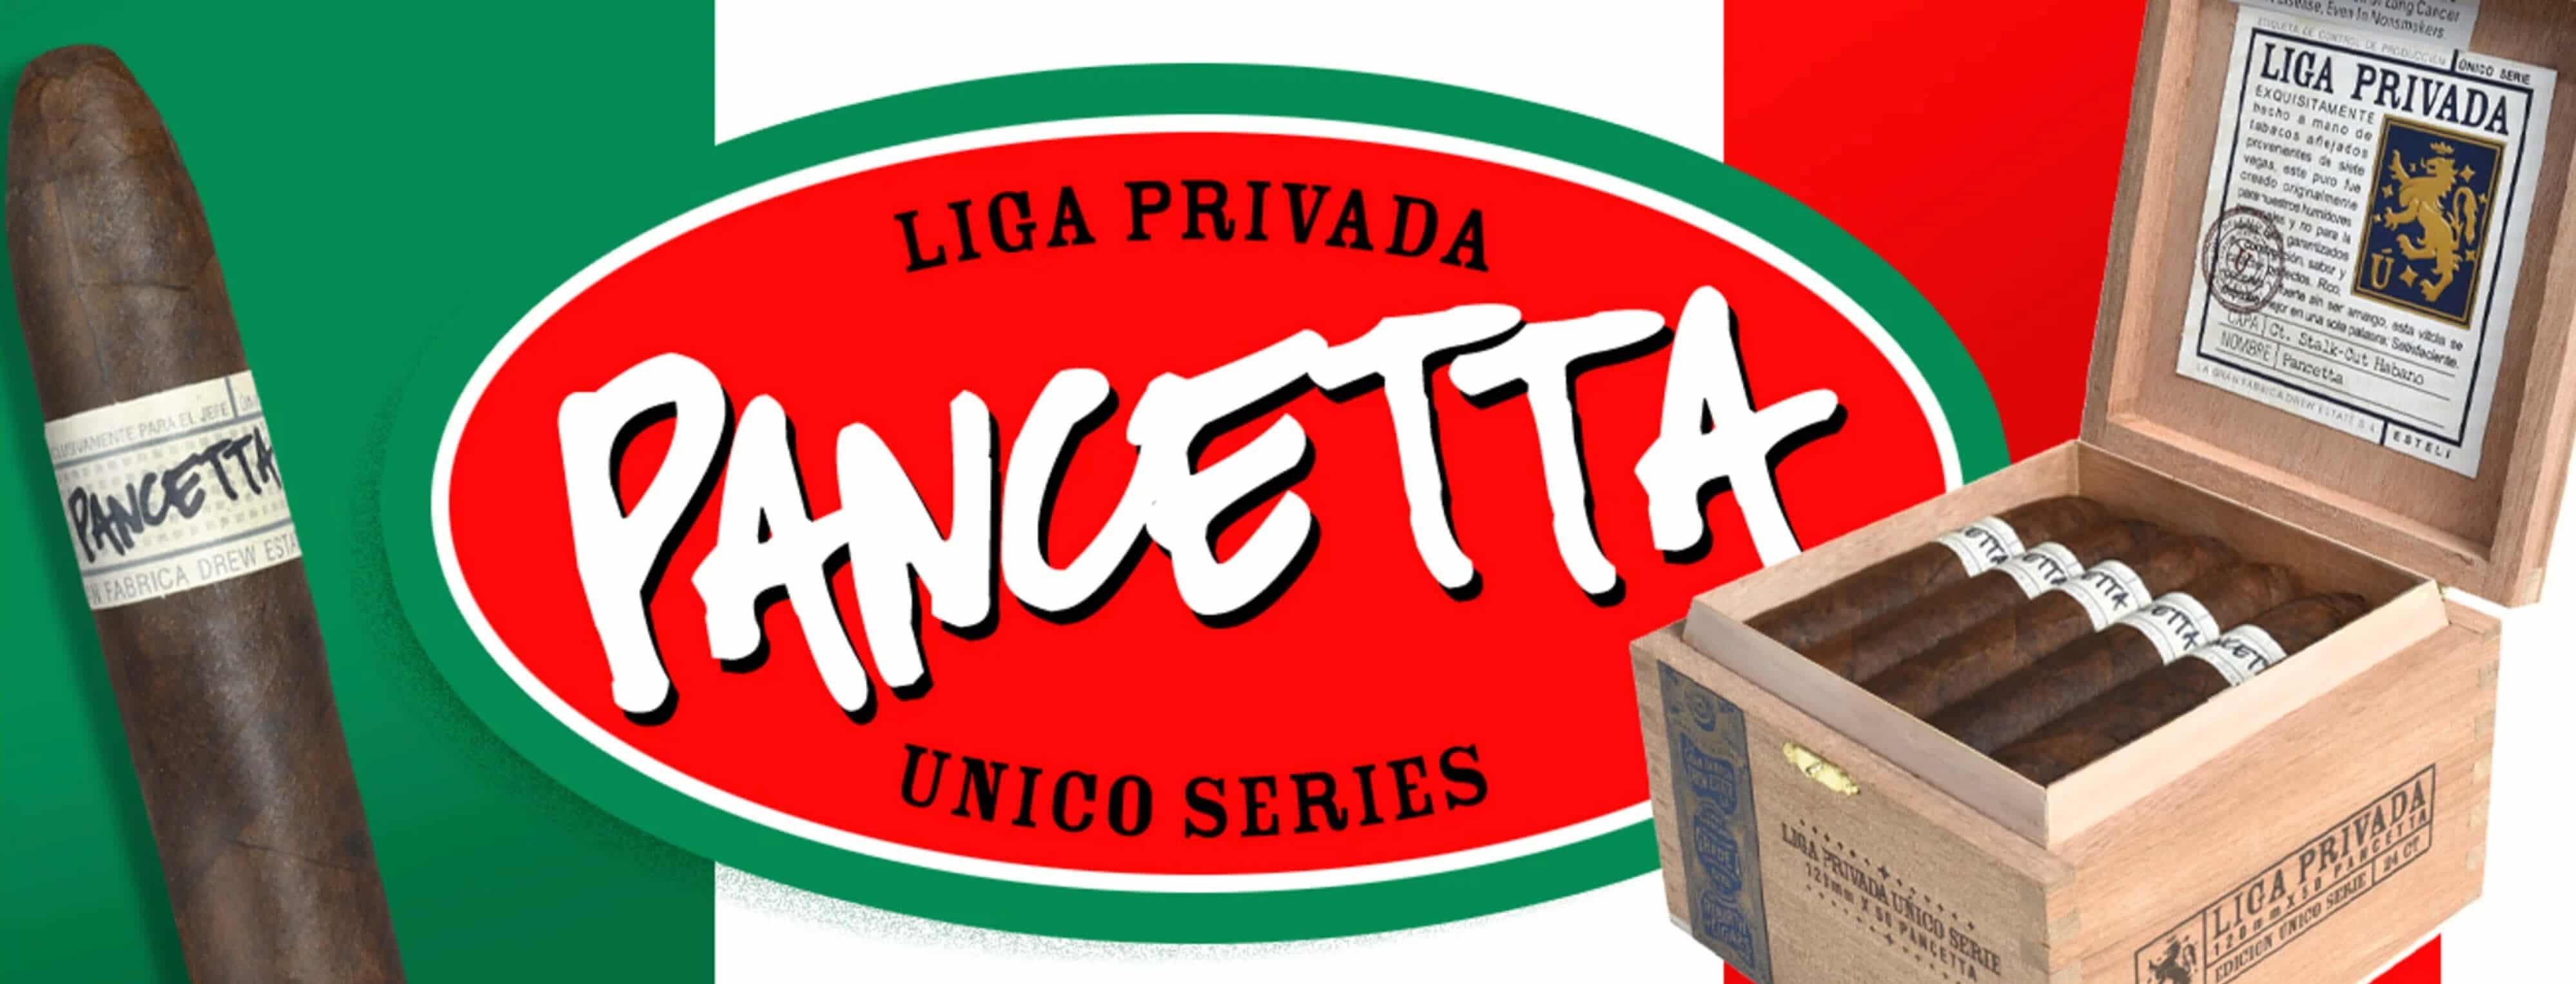 Liga Privada Unico Serie Pancetta returns